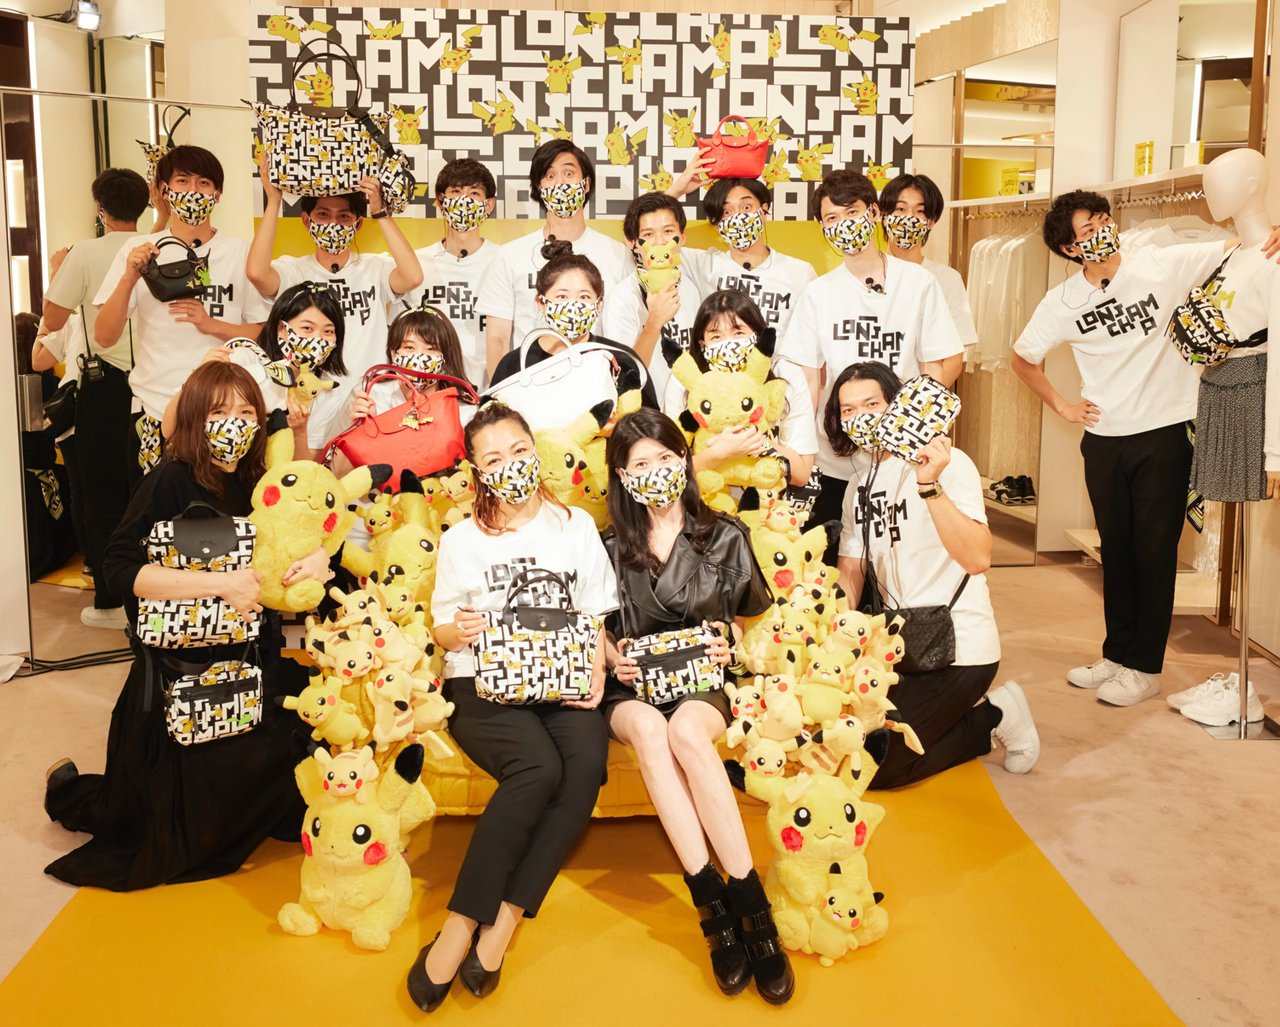 Longchamp x Pokemon Pop-Up Experience photo 1059931.jpg